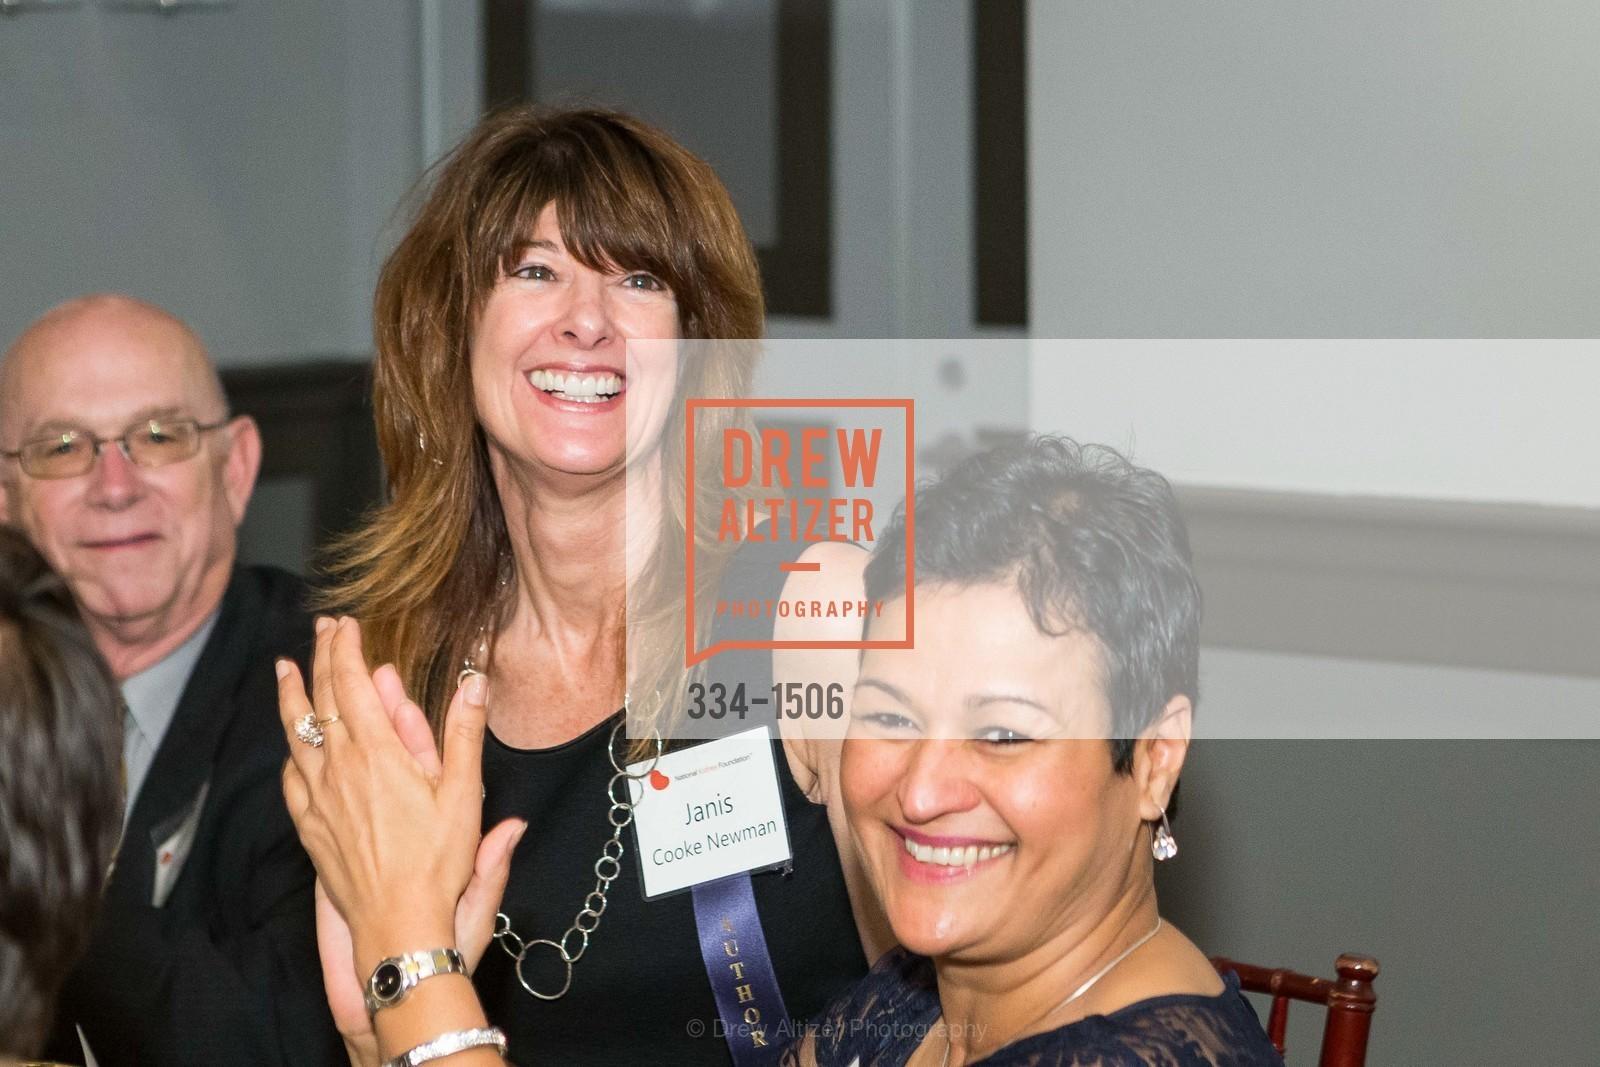 Janis Cooke Newman, Photo #334-1506